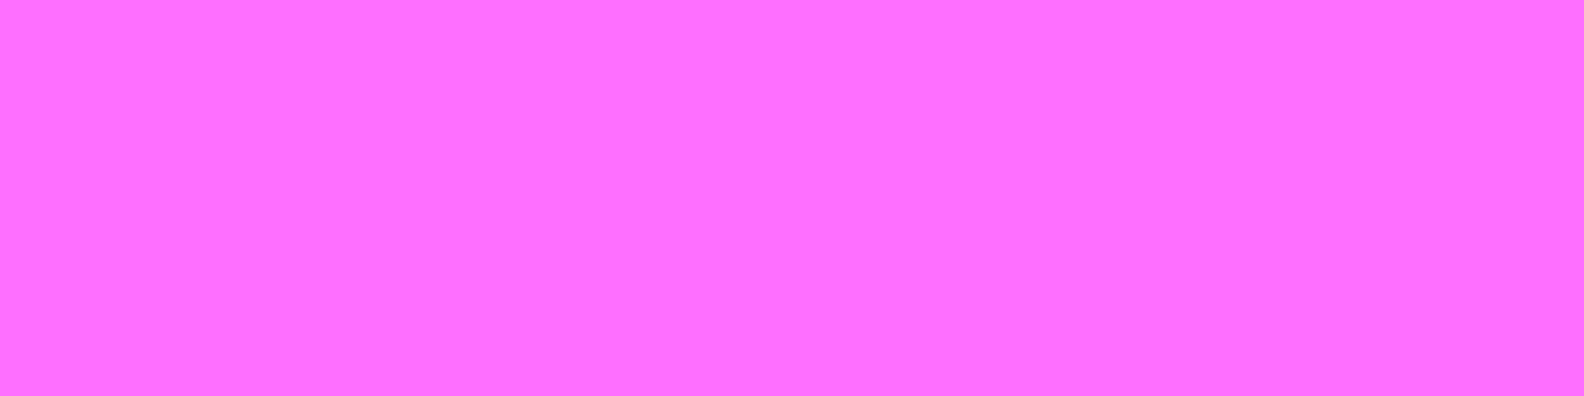 1584x396 Shocking Pink Crayola Solid Color Background